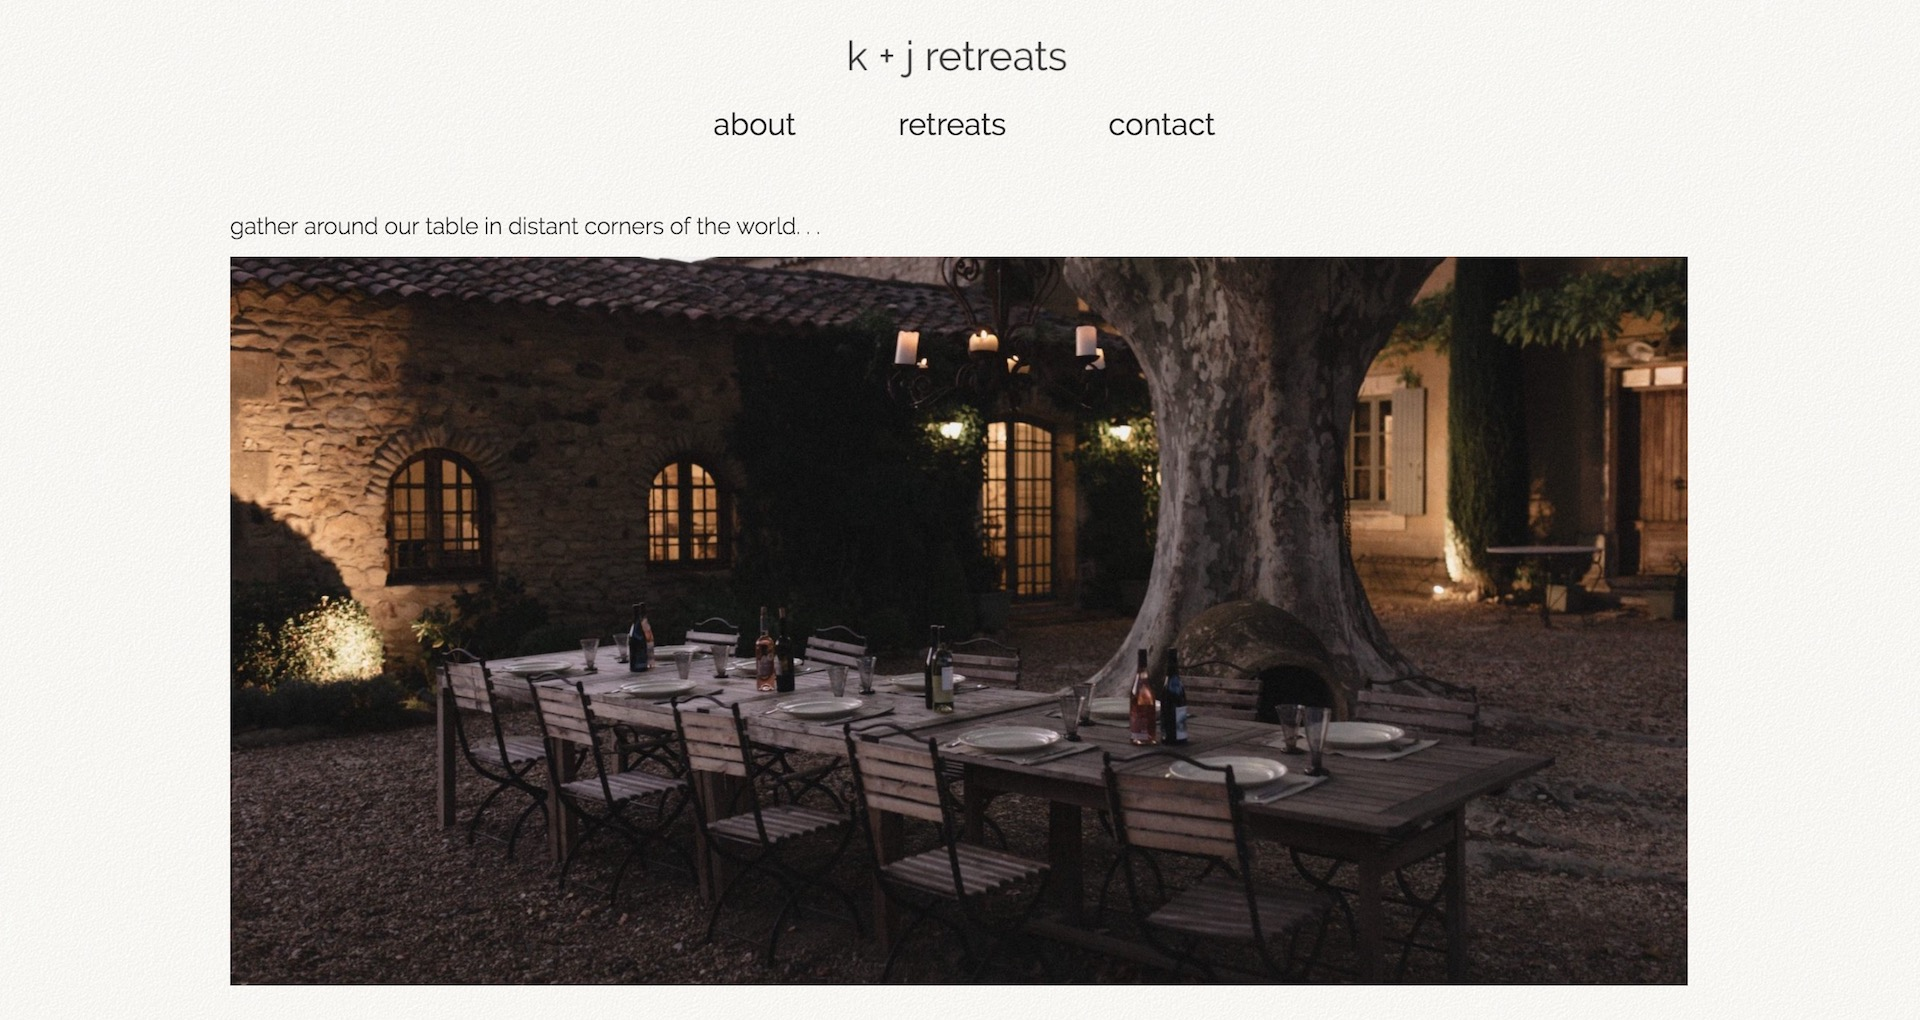 kj retreats